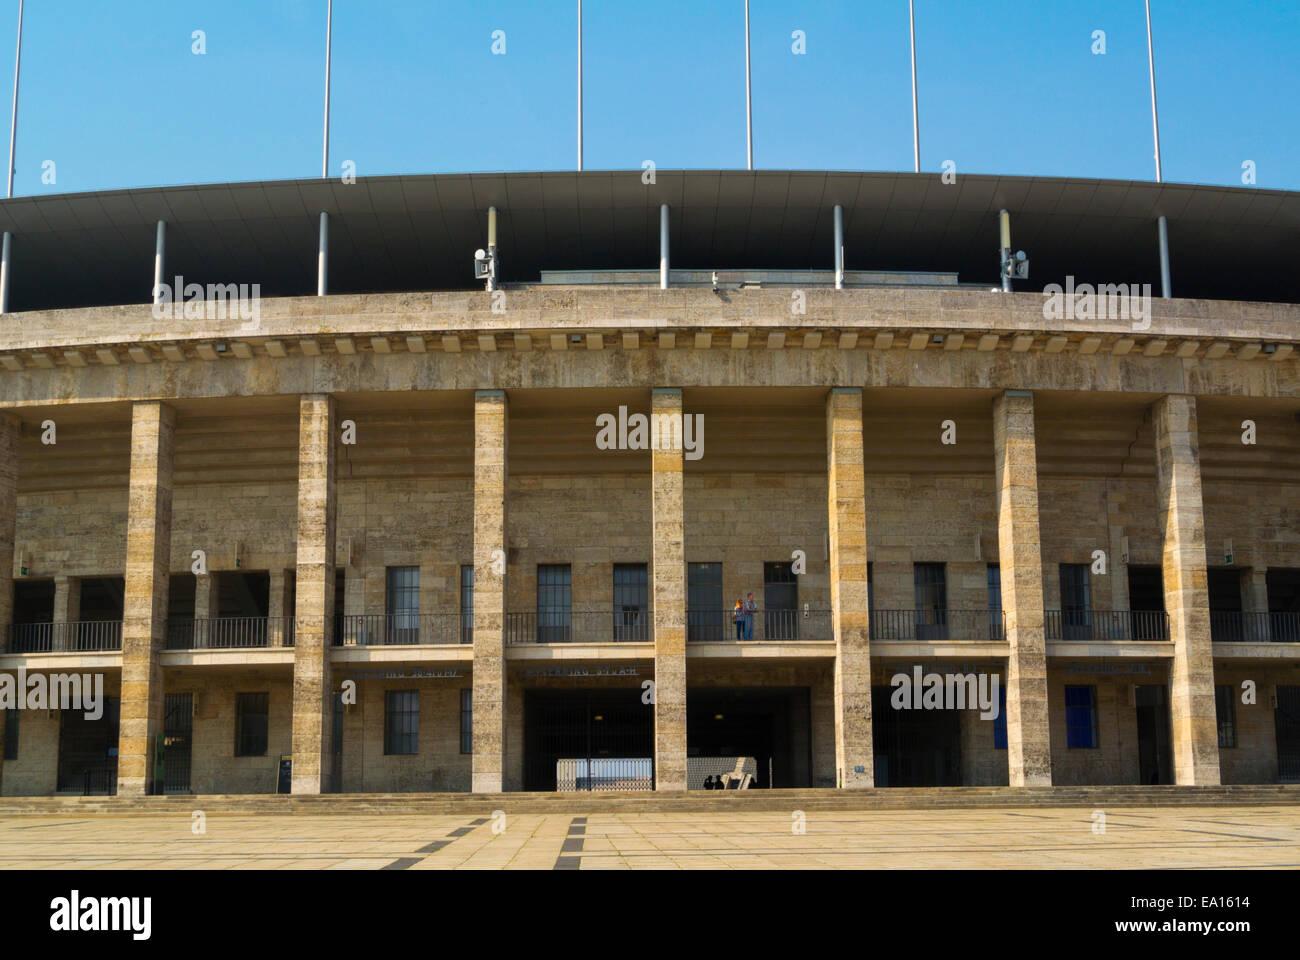 Olympia Stadion, The Olympic Stadium, Westend, Charlottenburg, Berlin, Germany - Stock Image